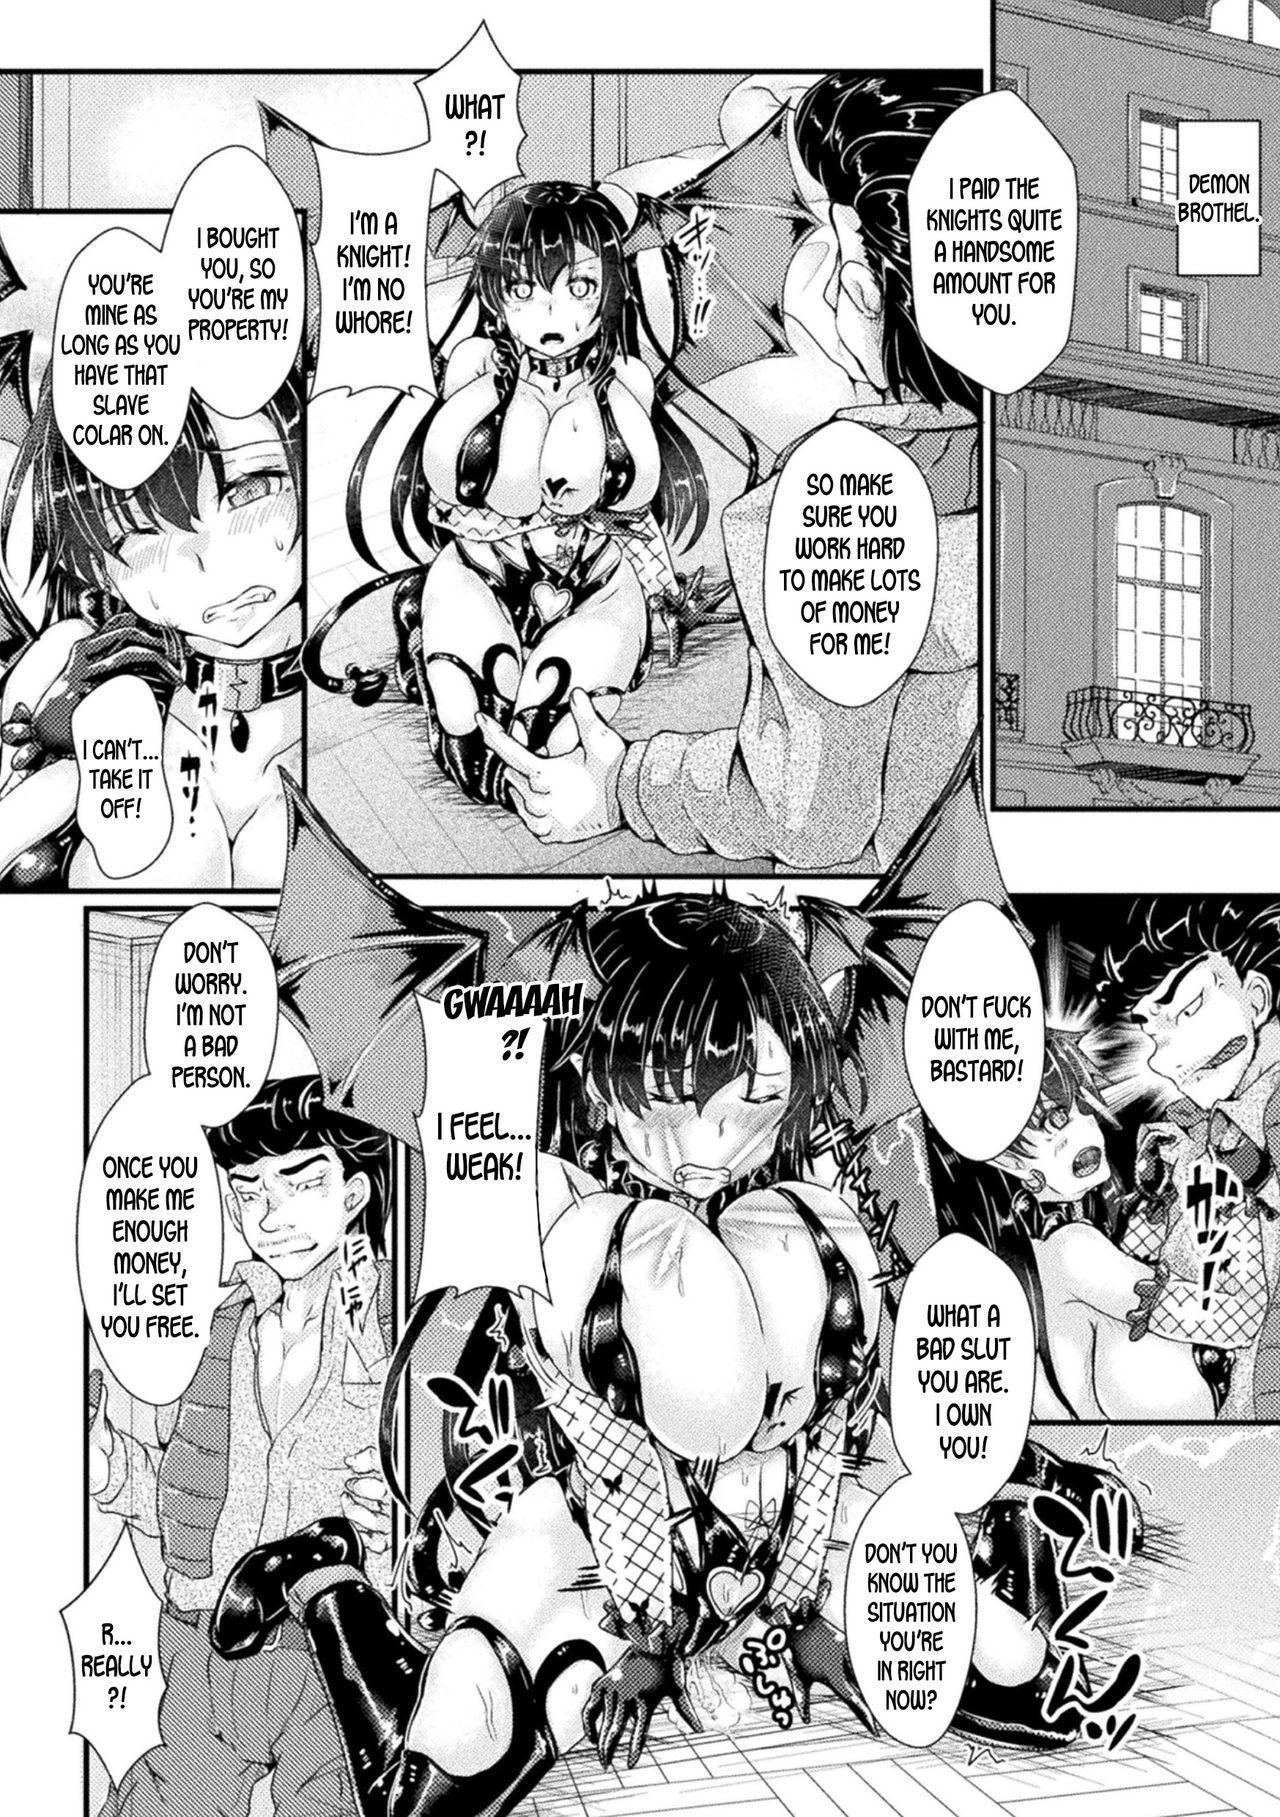 Nyotaika Kishi no Junan Inma Baishunfu Ochi | The Genderbent Knight's Passion Turn into a Succubus and Get Pregnant! 3